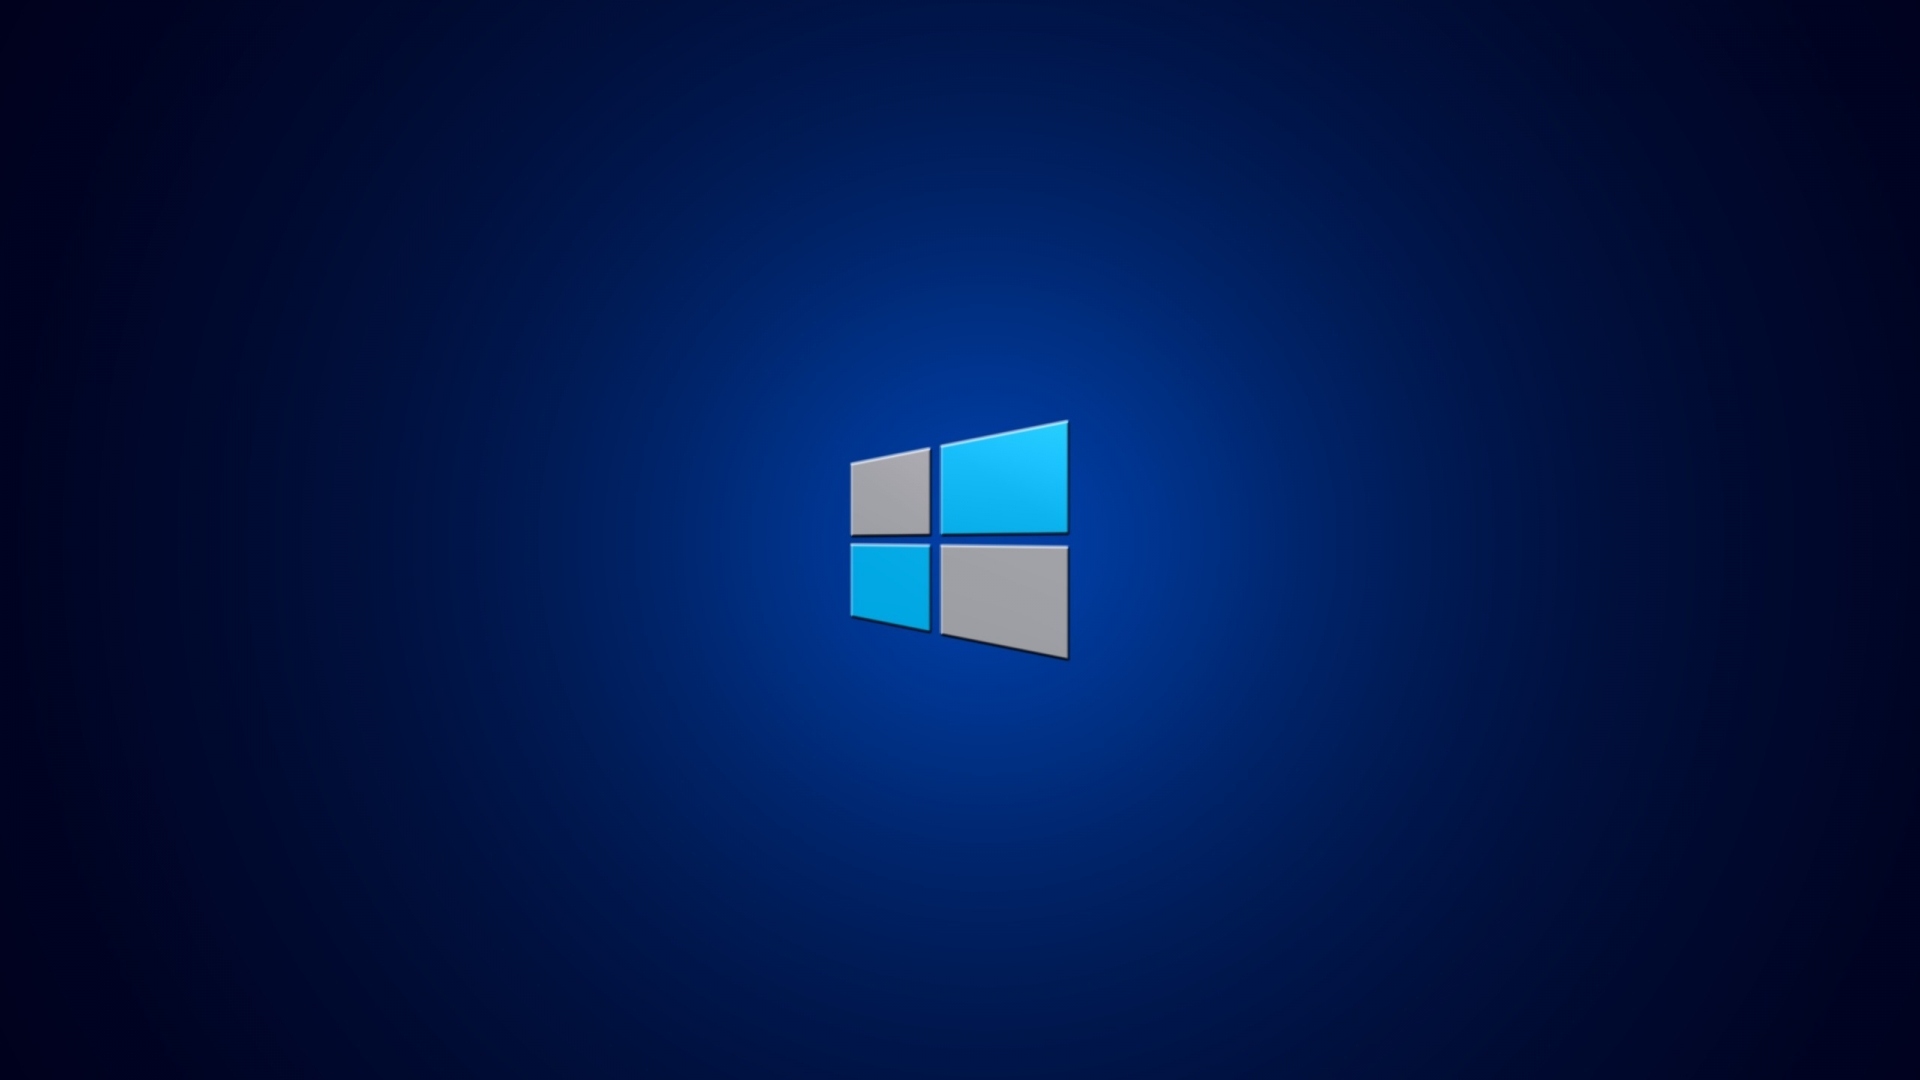 Windows 8 HD Wallpaper Background Image 1920x1080 ID458123 1920x1080